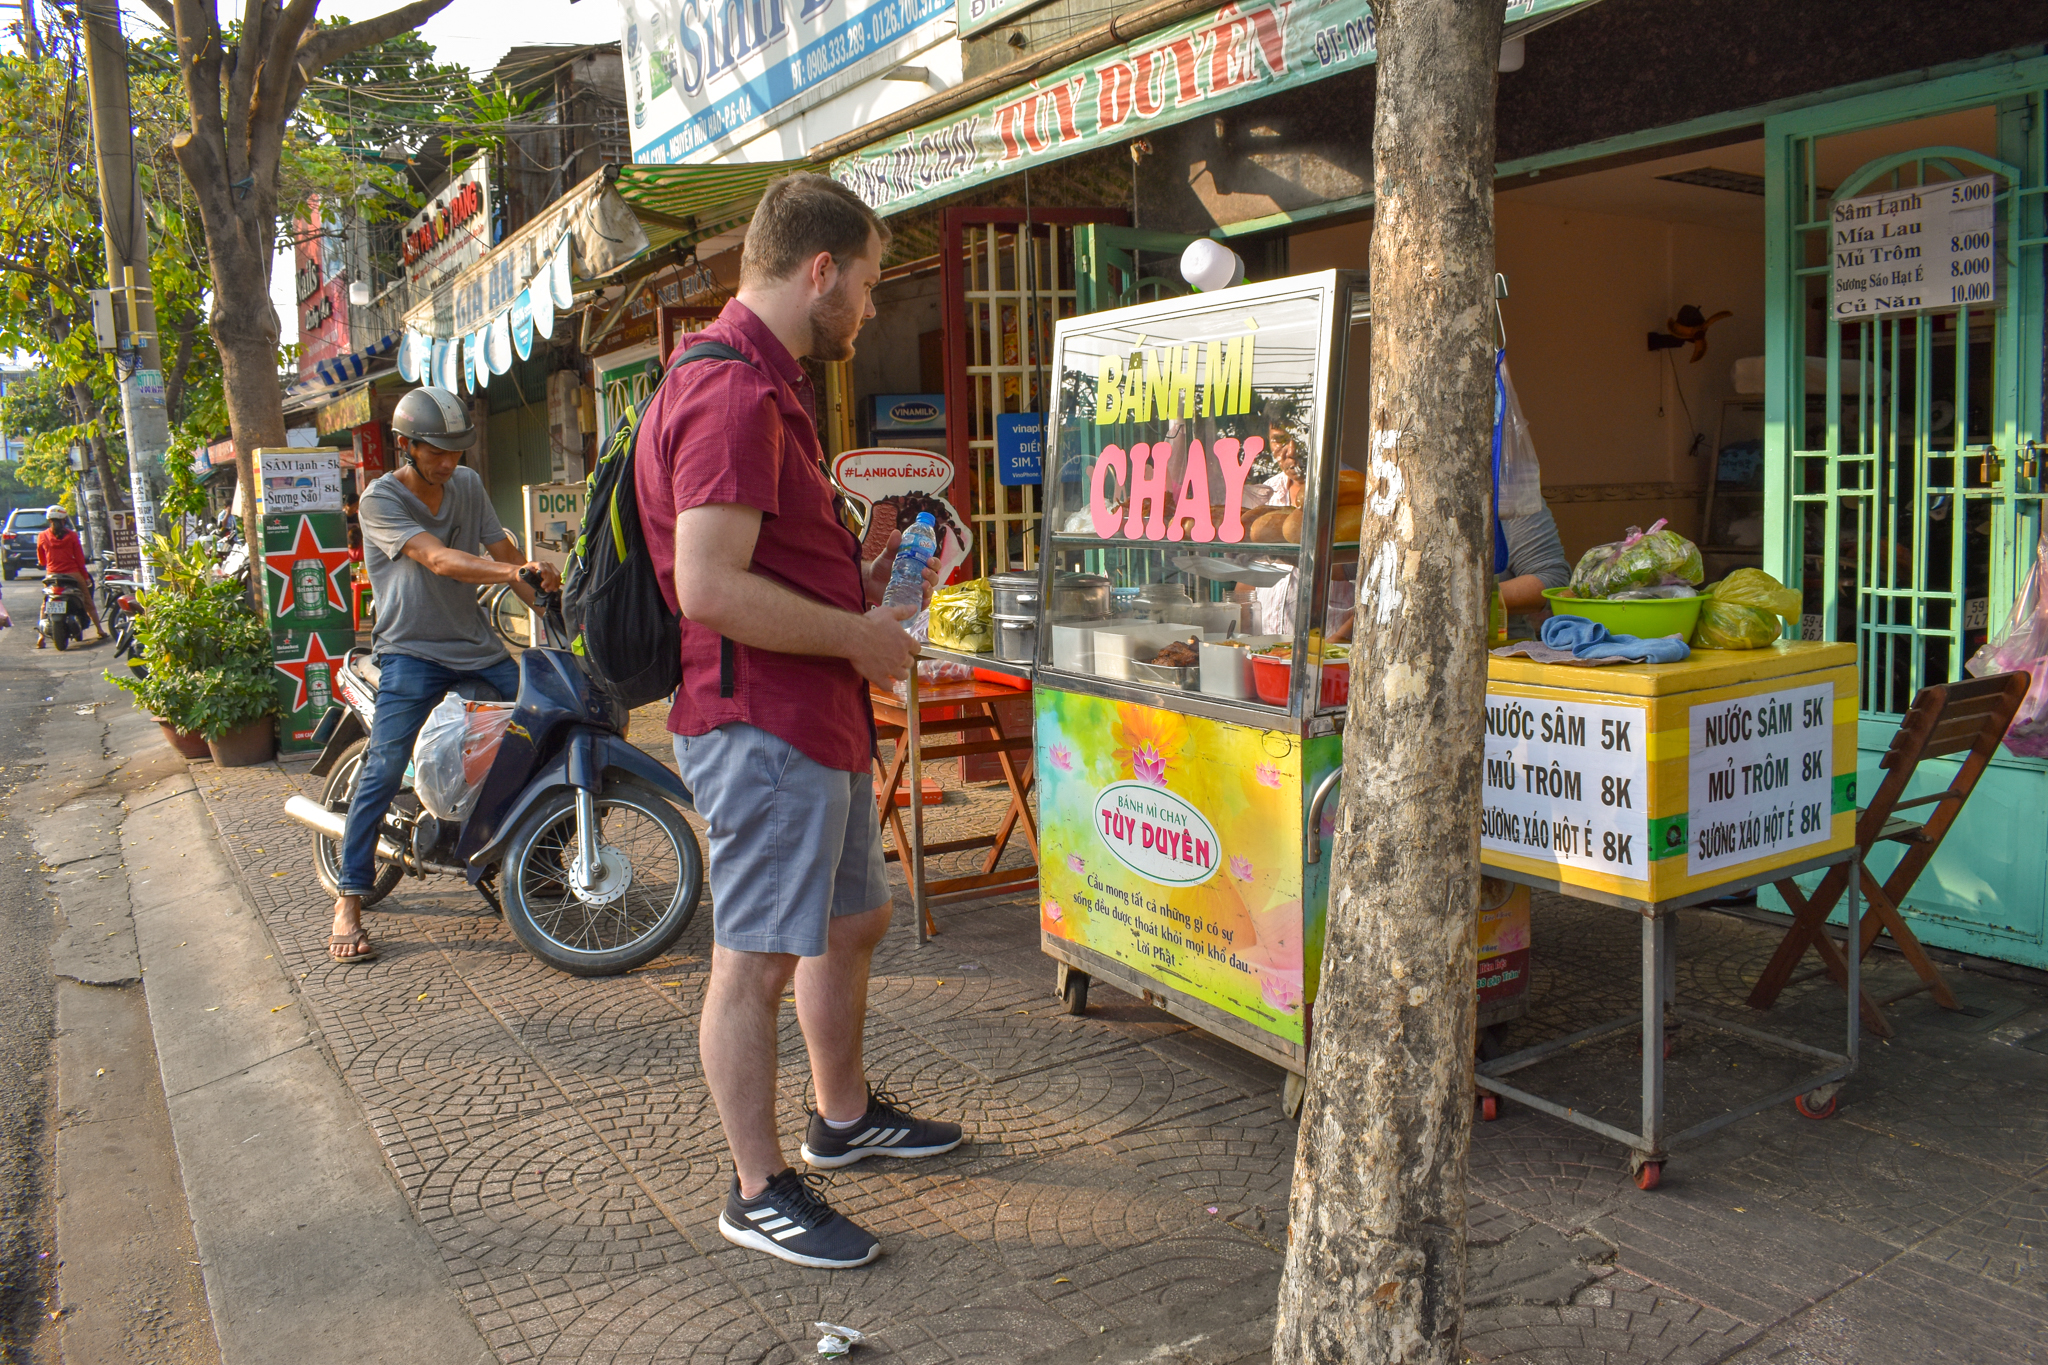 Uprooted-Traveler-Ho-Chi-Minh-Banh-Mi-Tuy-Duyen-vegan-guide-saigon-chay.jpg